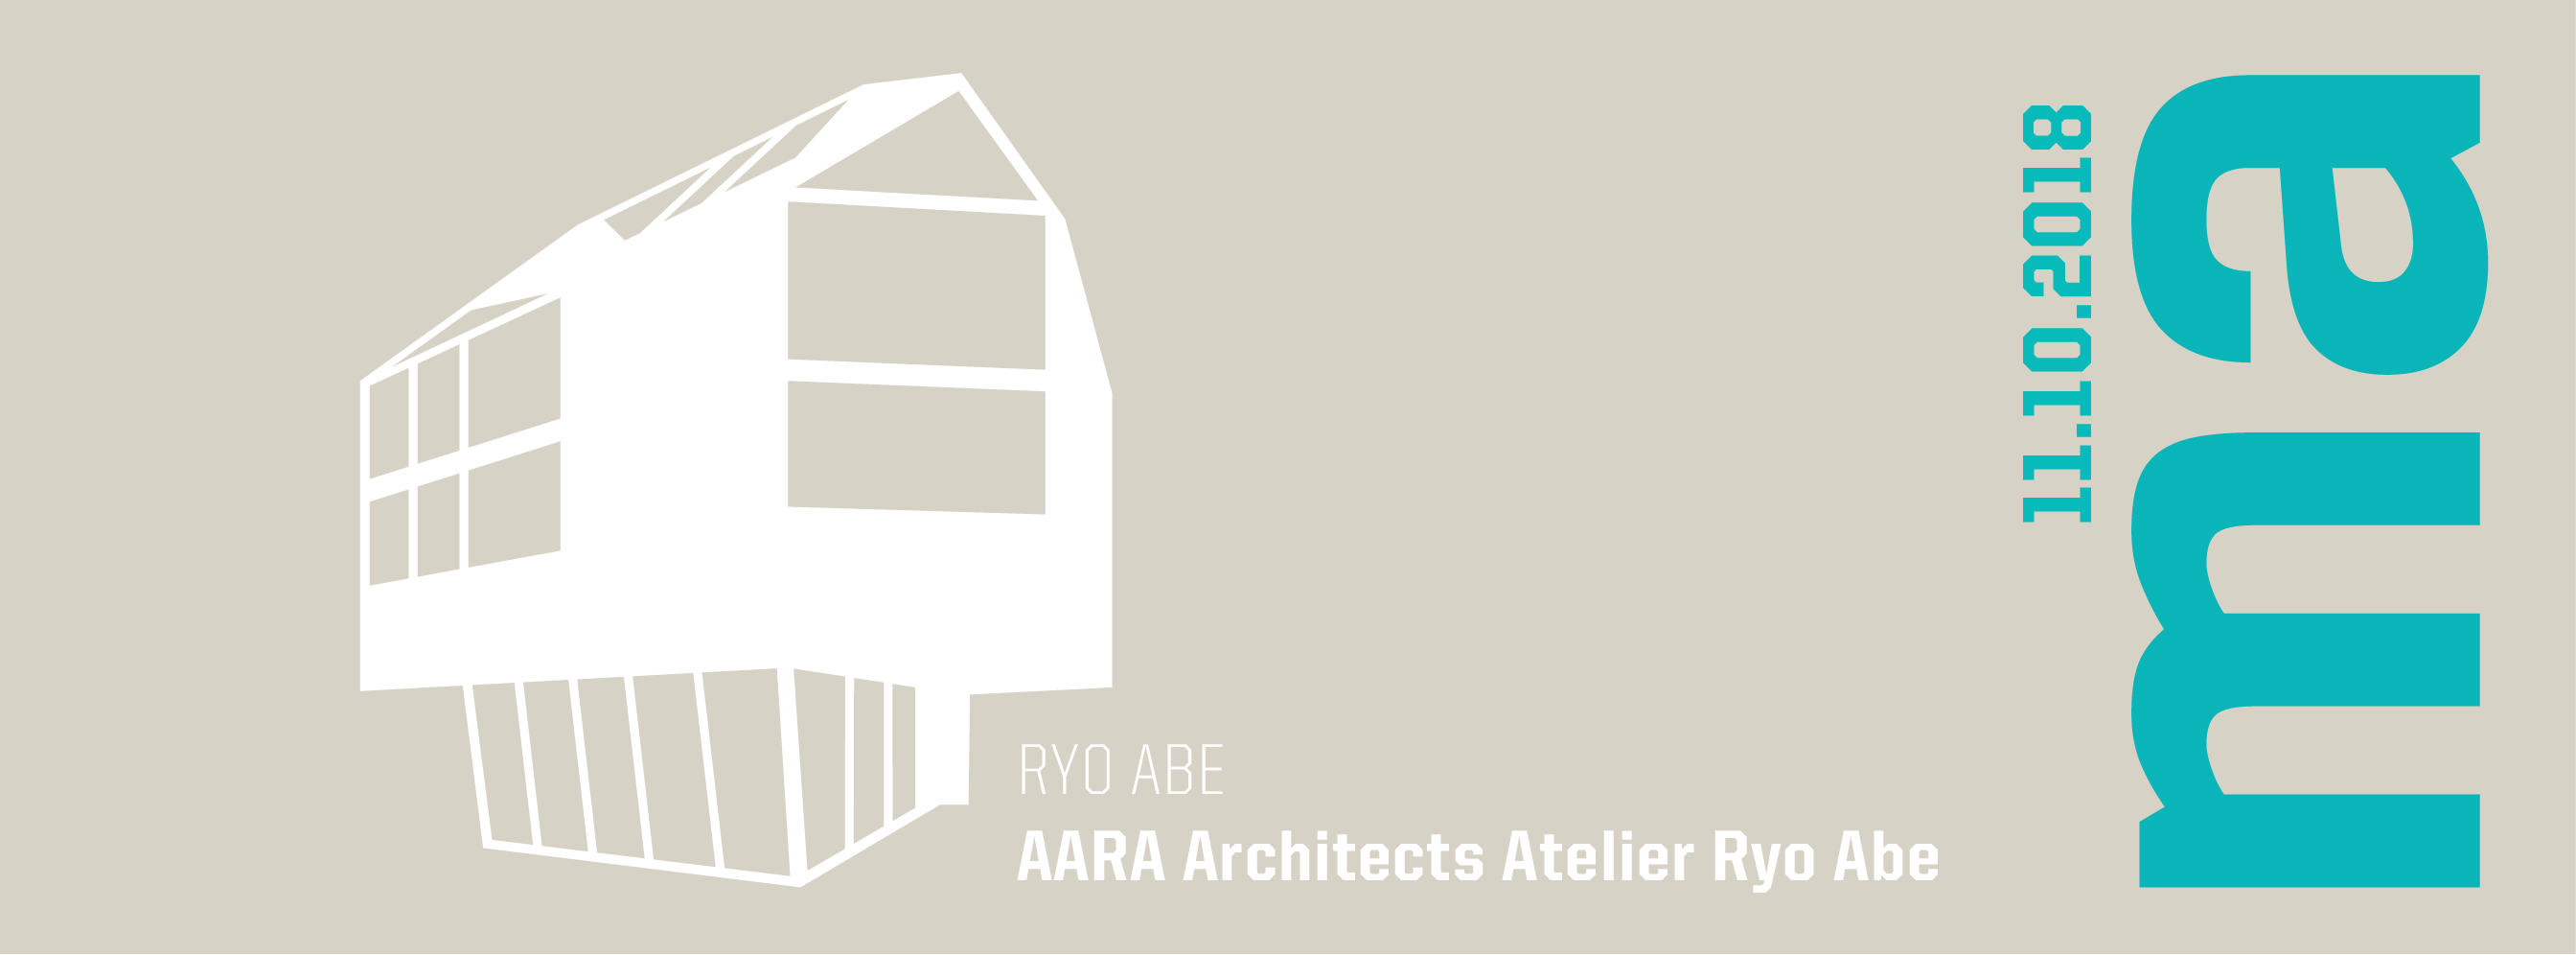 Ryo_Abe_MA